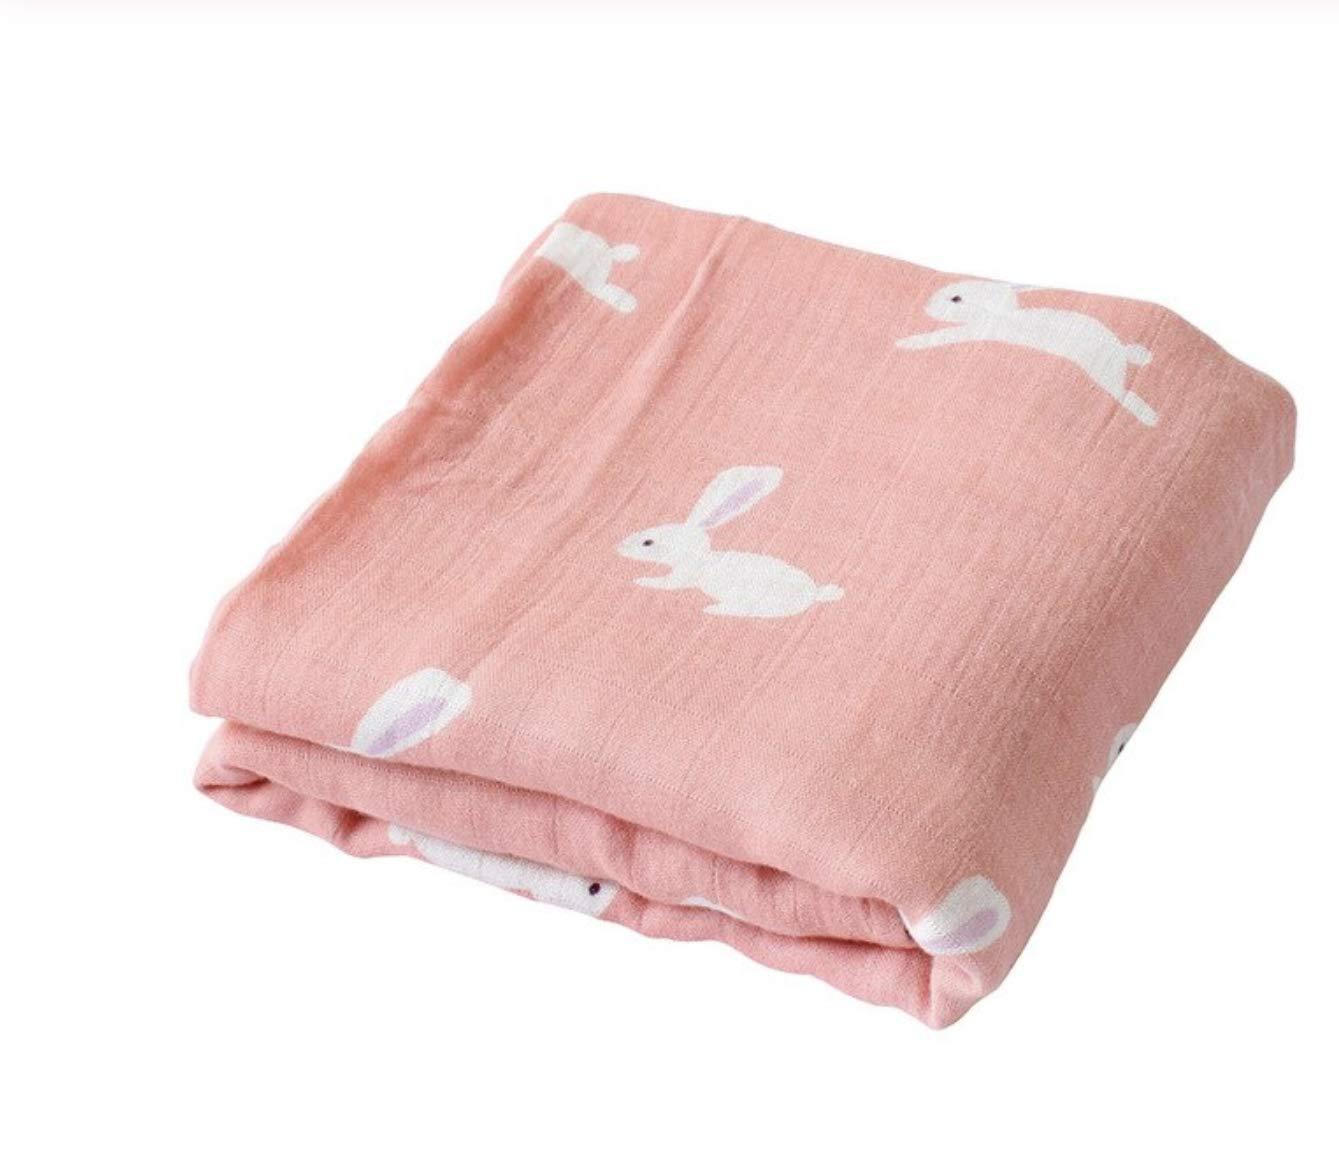 Polar Bear 47x47 Soft Muslin Cotton Oversized Swaddle Unisex Tiny Alpaca Premium Baby Bamboo Blankets Muslin